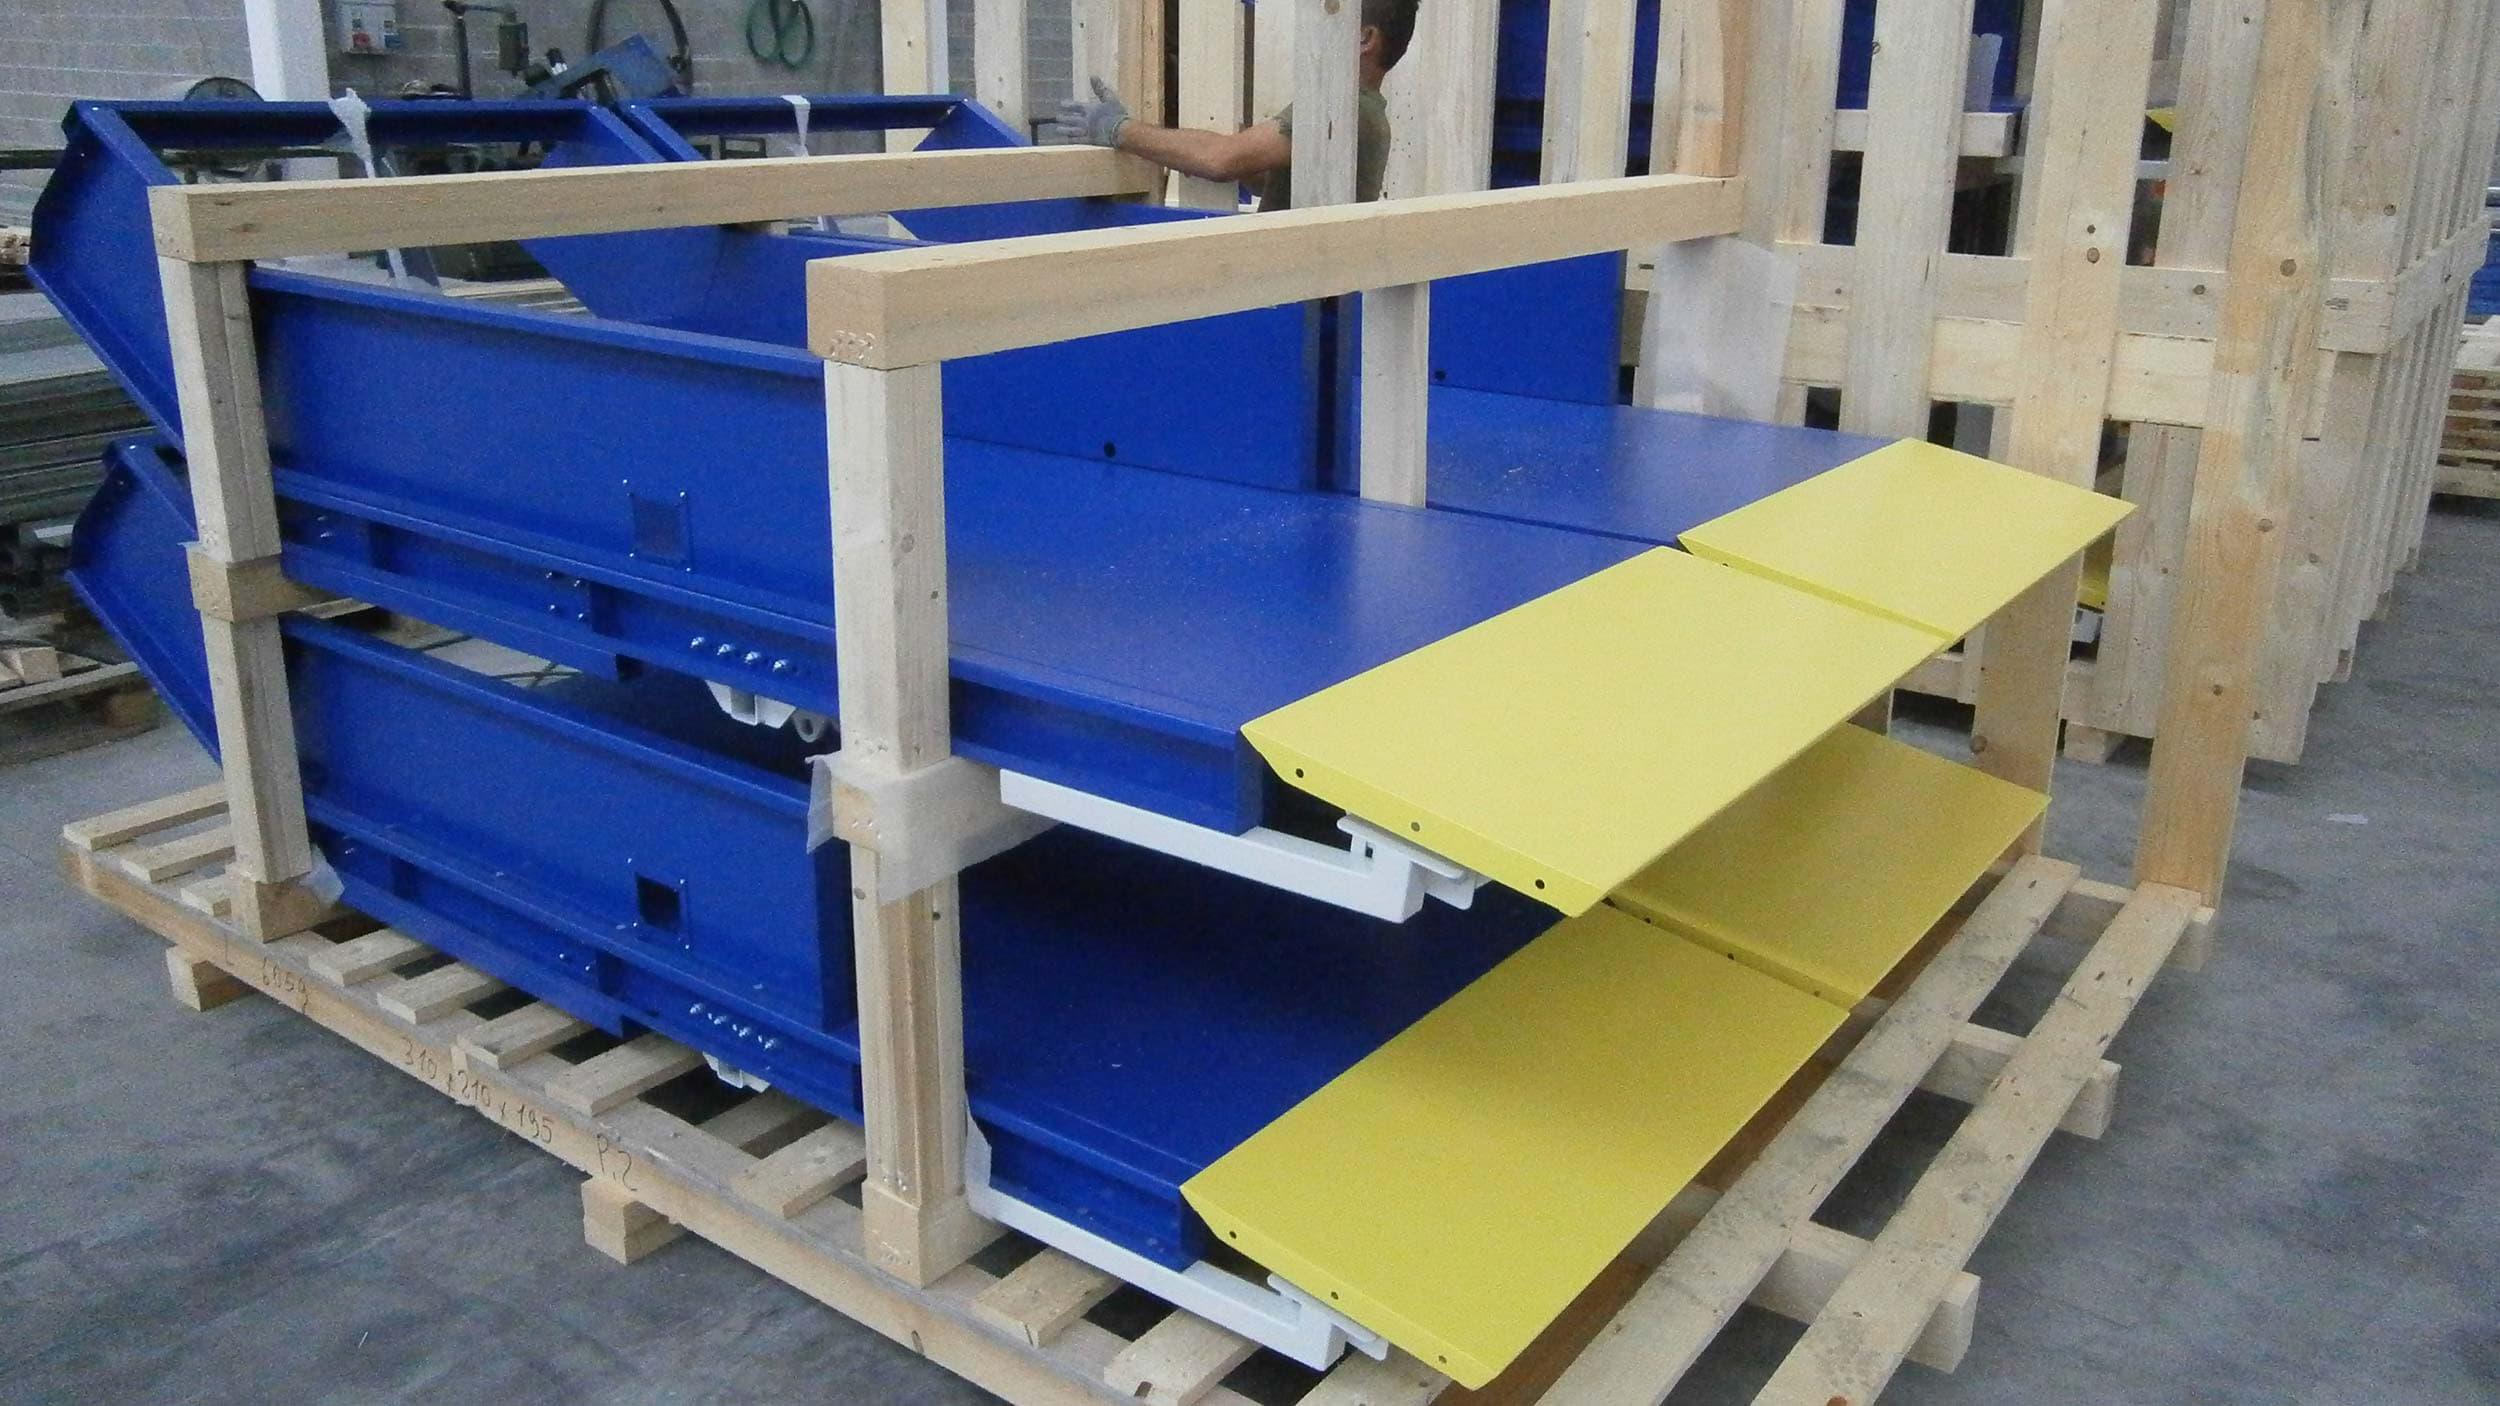 Carpenteria Manessi Brescia - Industrial assembly